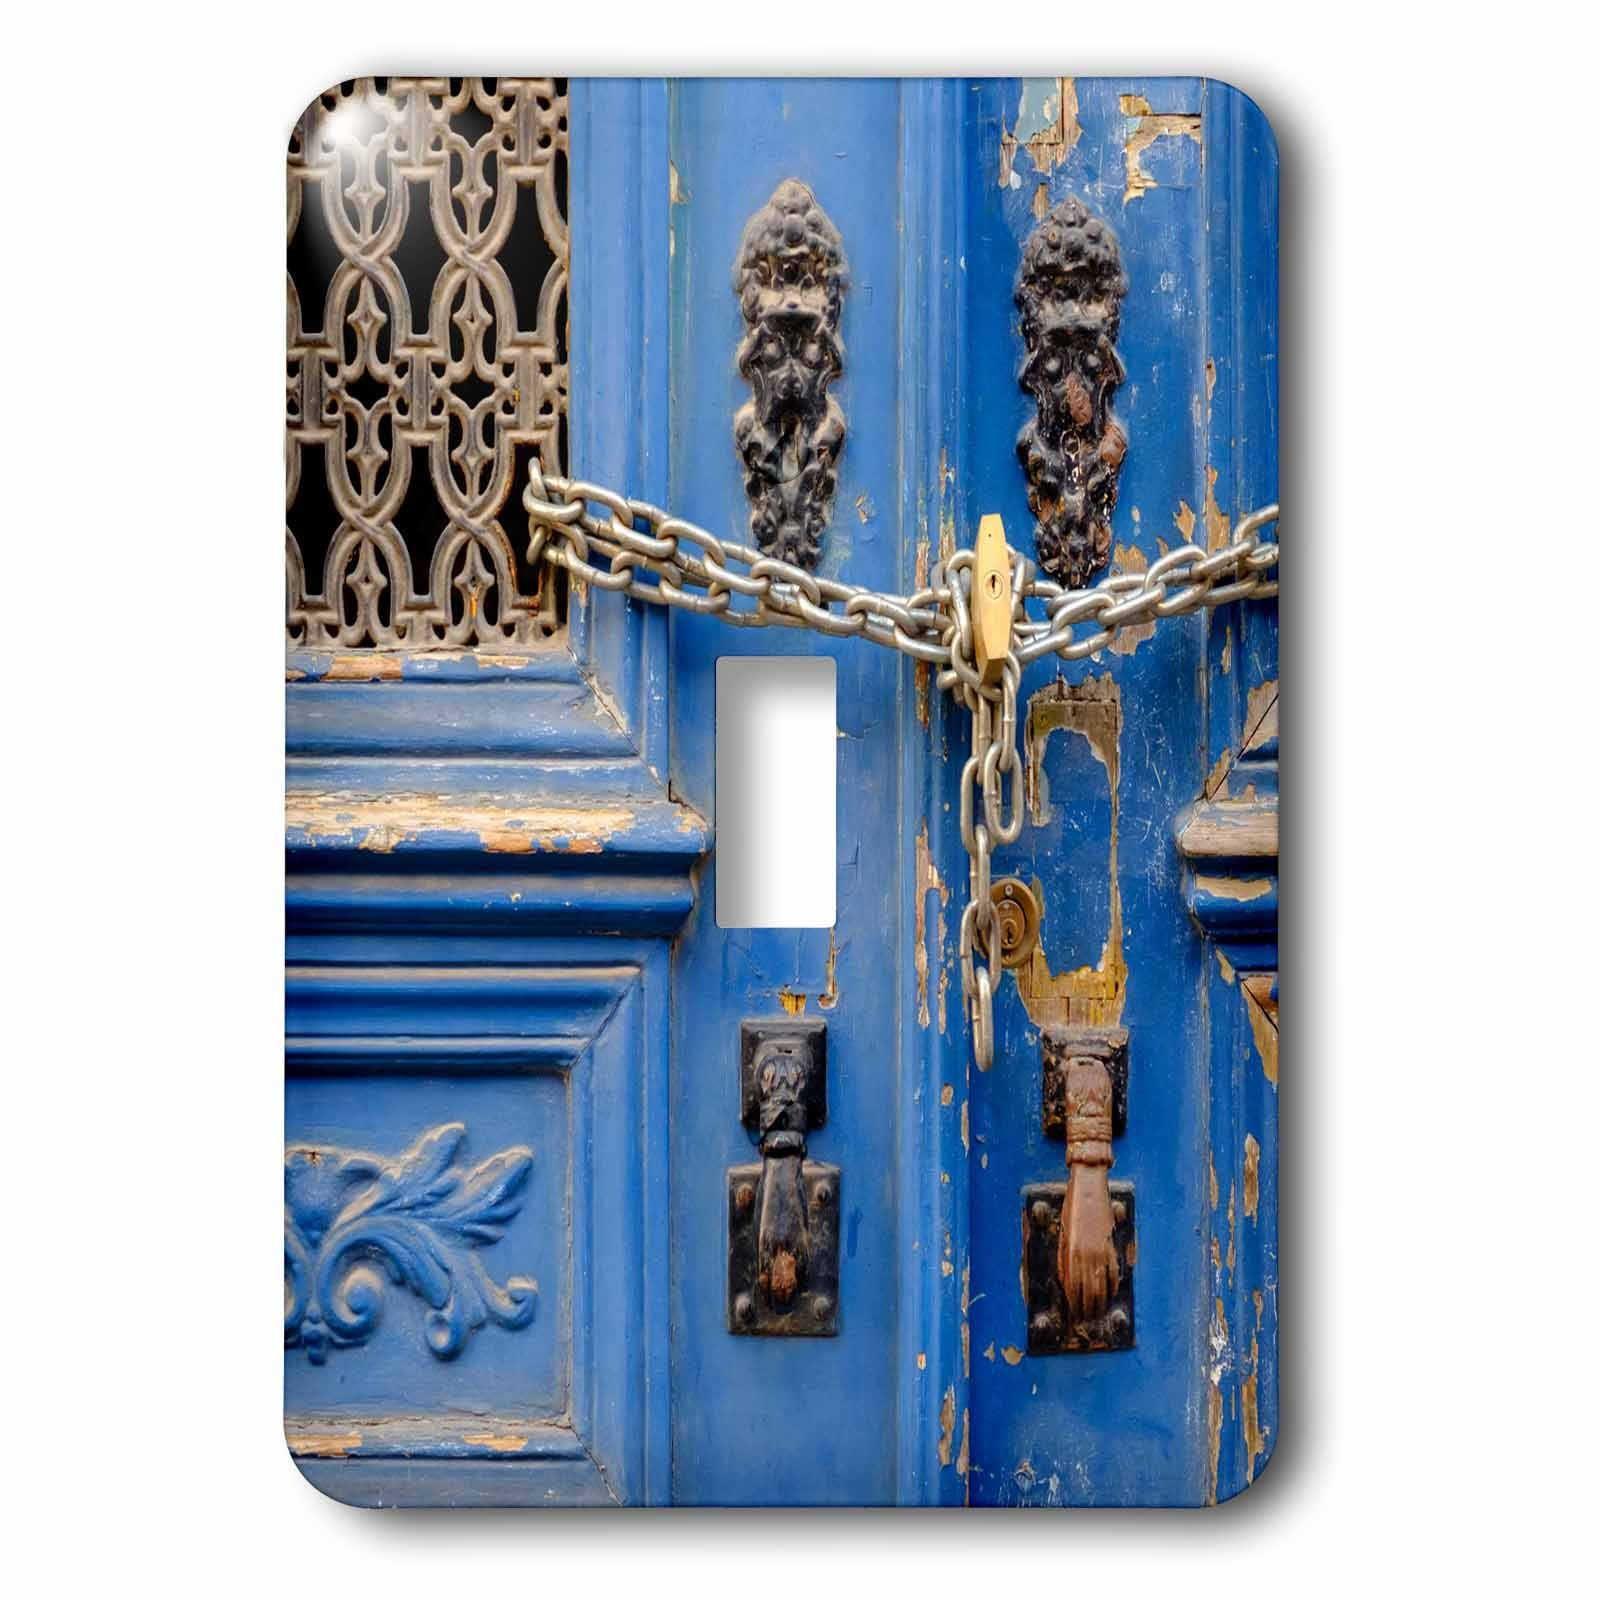 3dRose Danita Delimont - Lisbon - Portugal, Lisbon. Blue door, chain lock, Hand of Fatima door knockers. - Light Switch Covers - single toggle switch (lsp_249438_1)